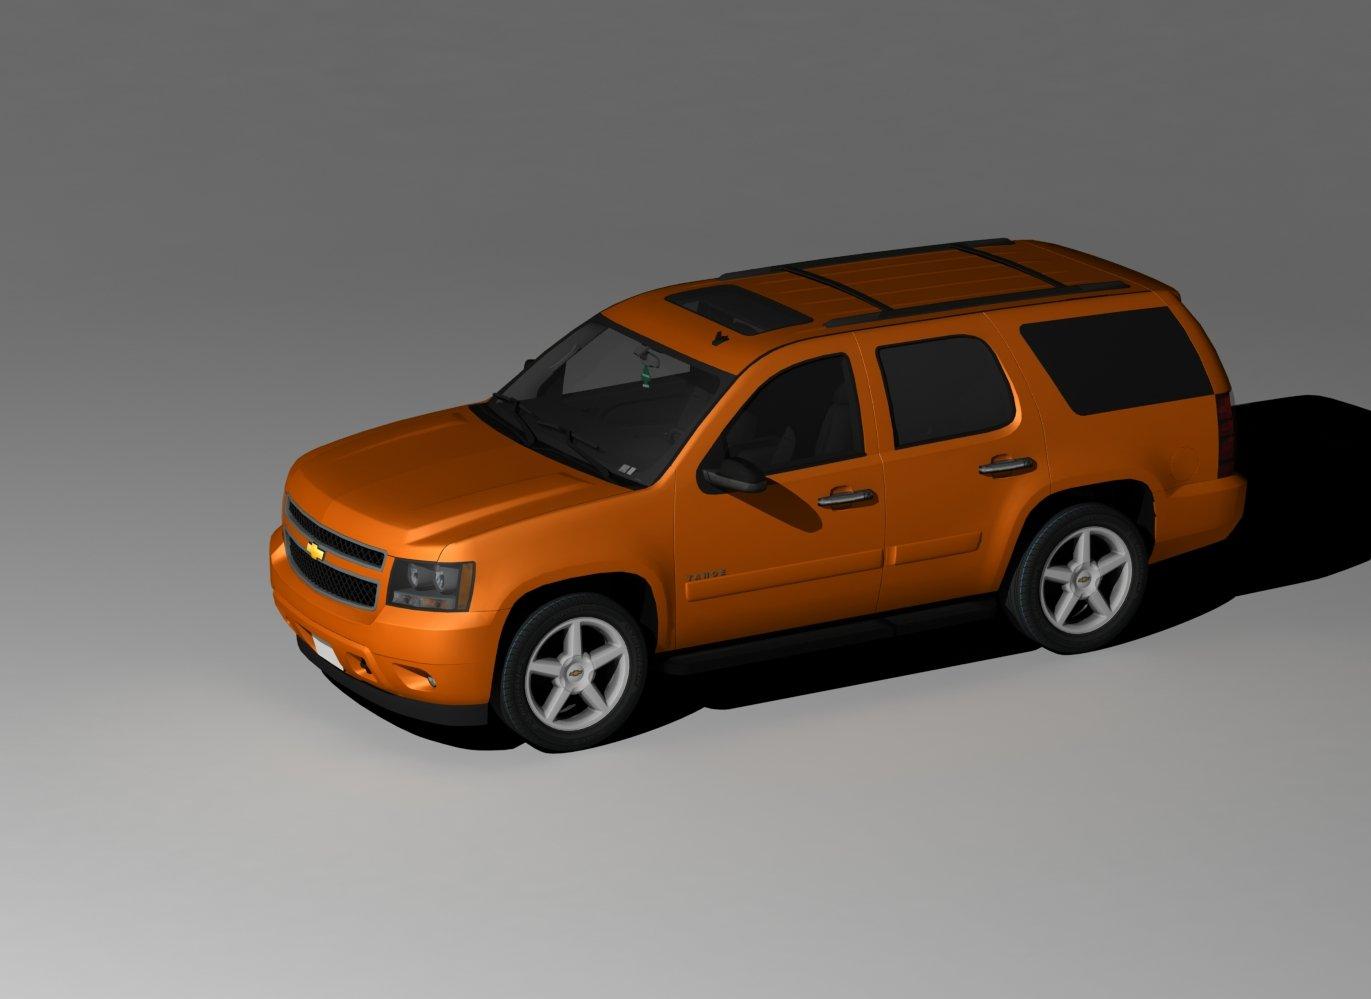 Chevrolet Truck Models >> Chevrolet Tahoe 2008 | Free 3D models